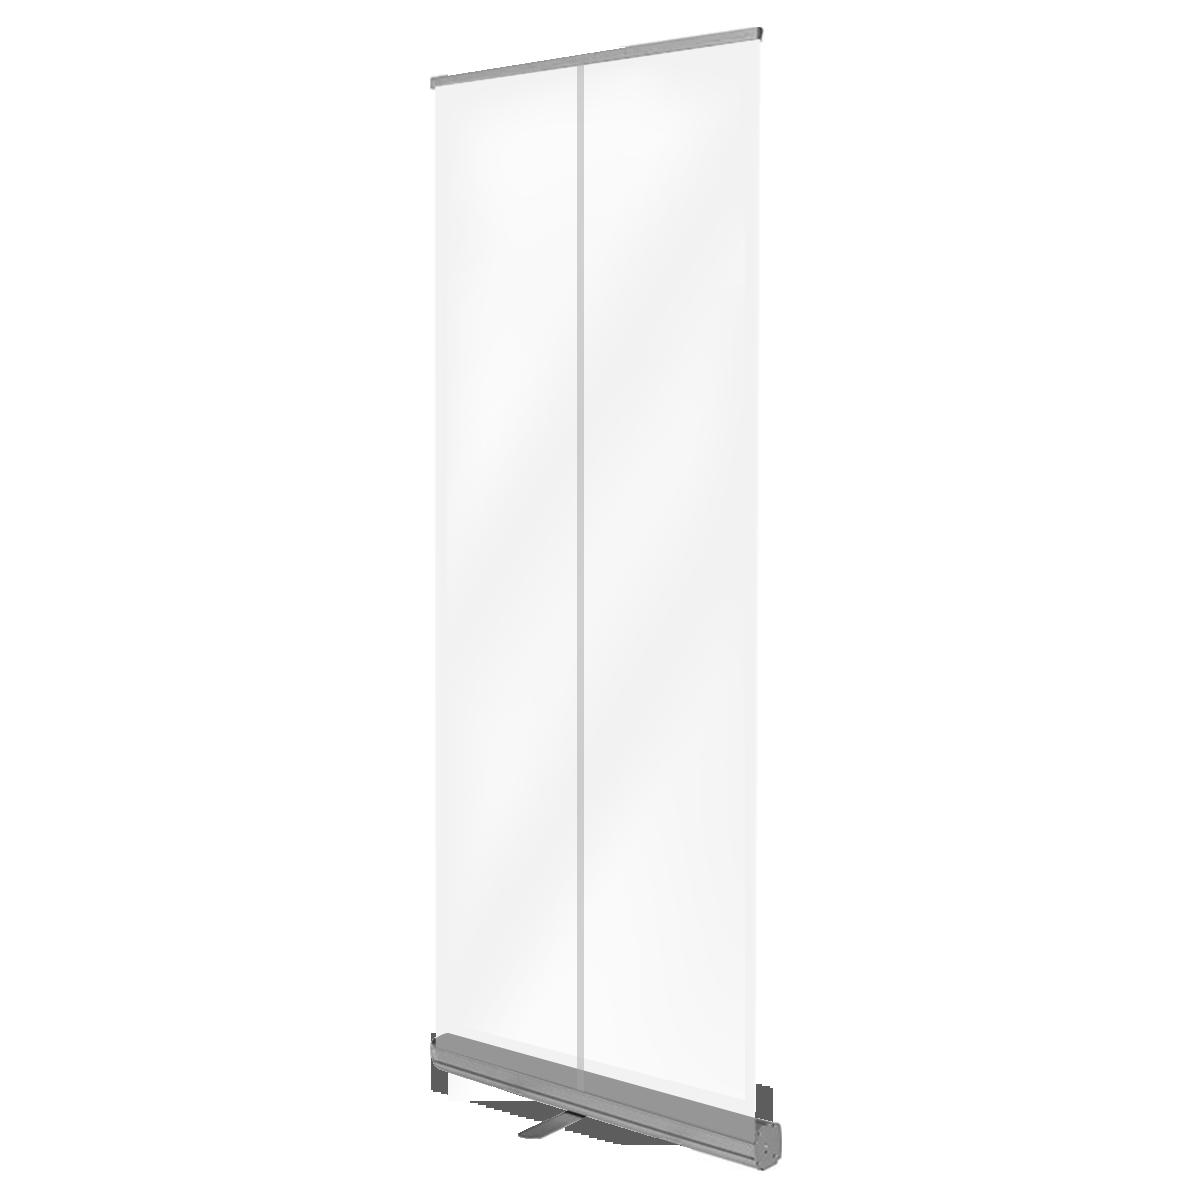 Mobile Schutzwand / transparent